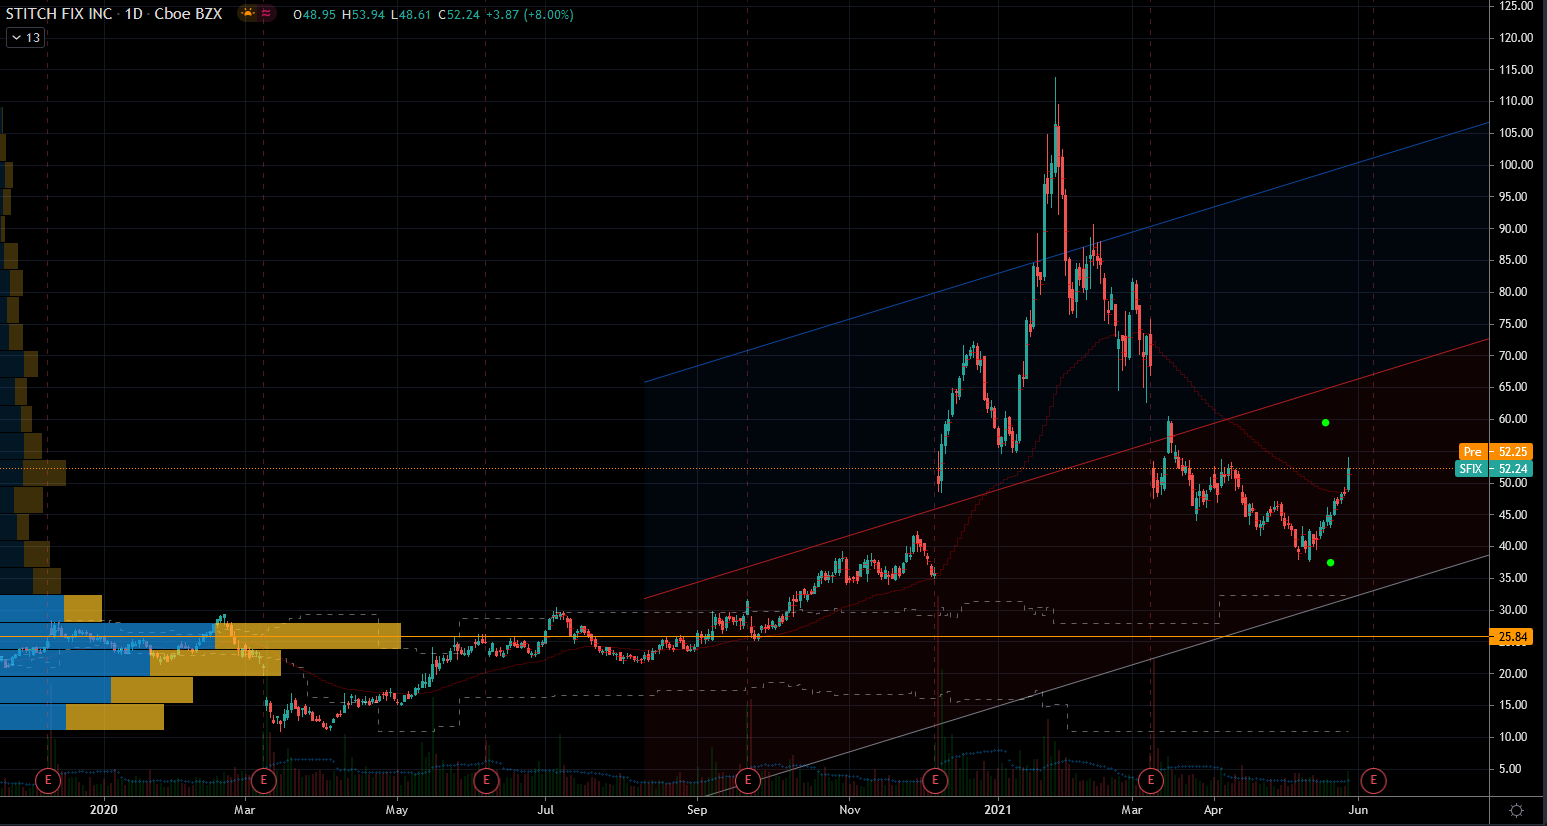 Wild Stocks: Stitch Fix (SFIX) Stock Chart Showing Tight Range